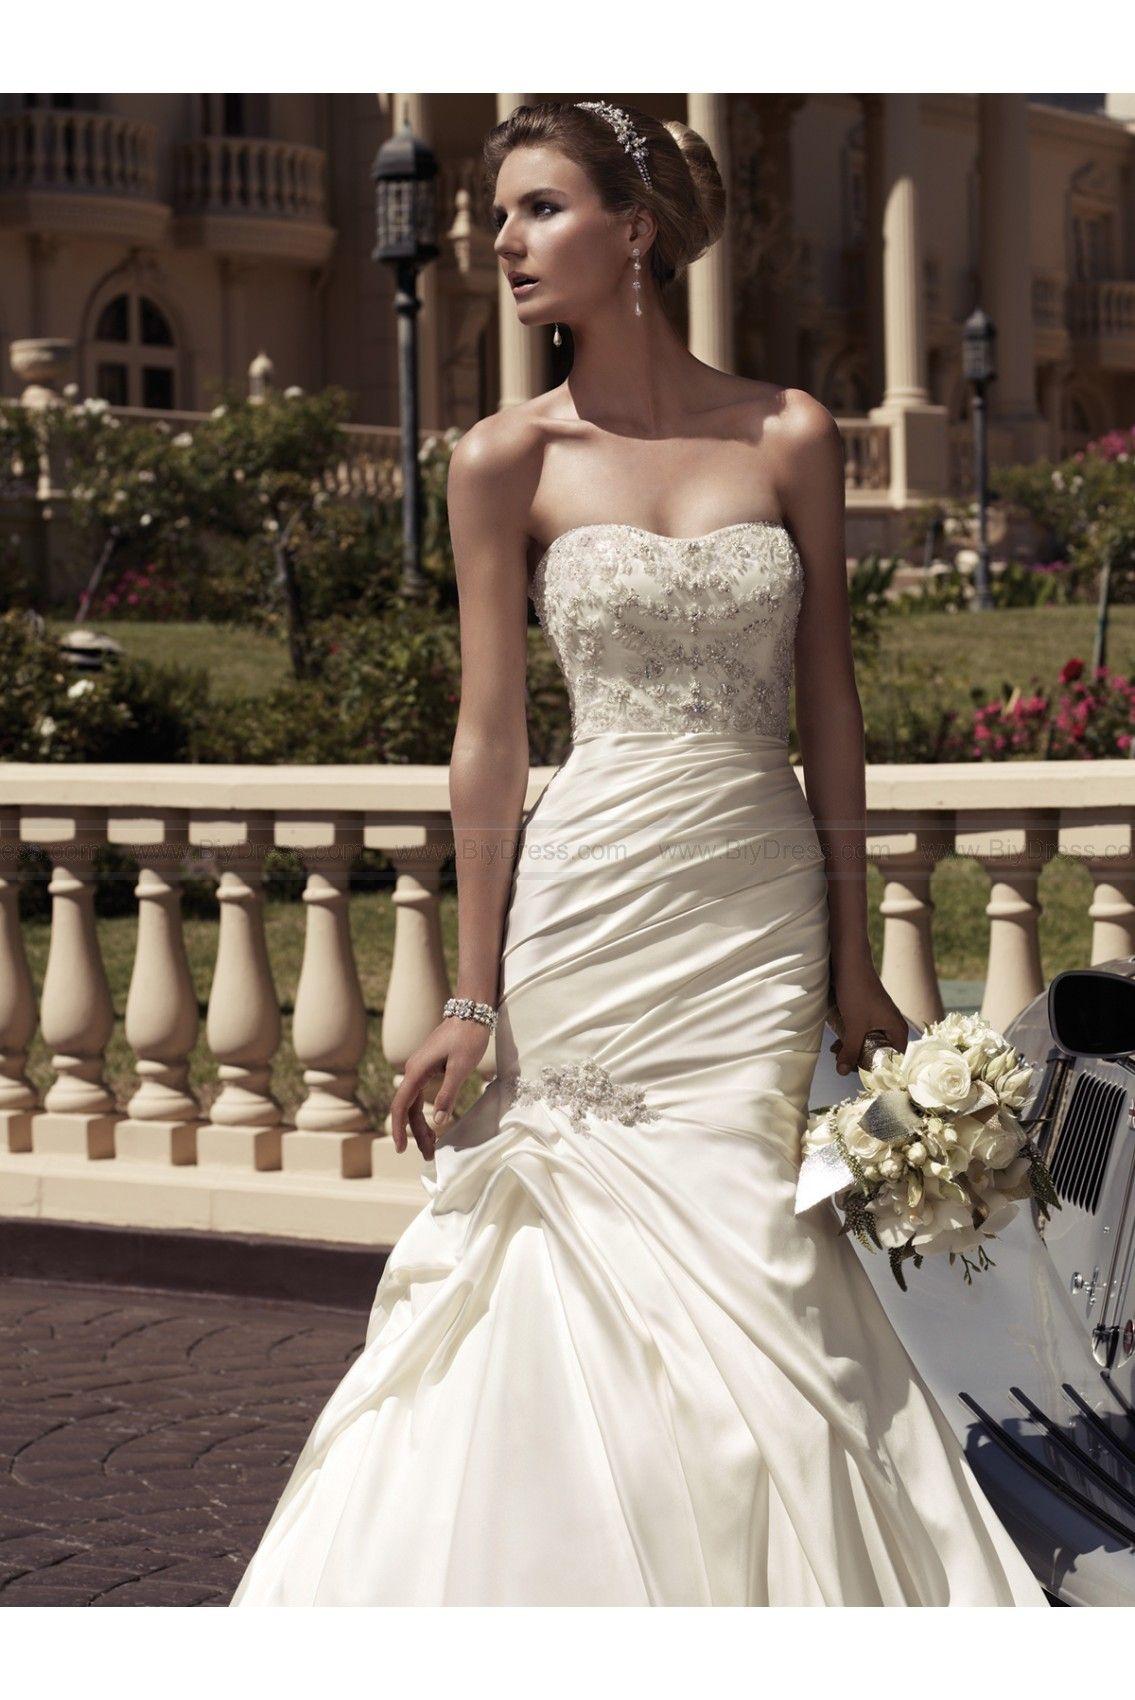 Dazzling Mermaid Bridal Dress With Pick Ups By Casablanca